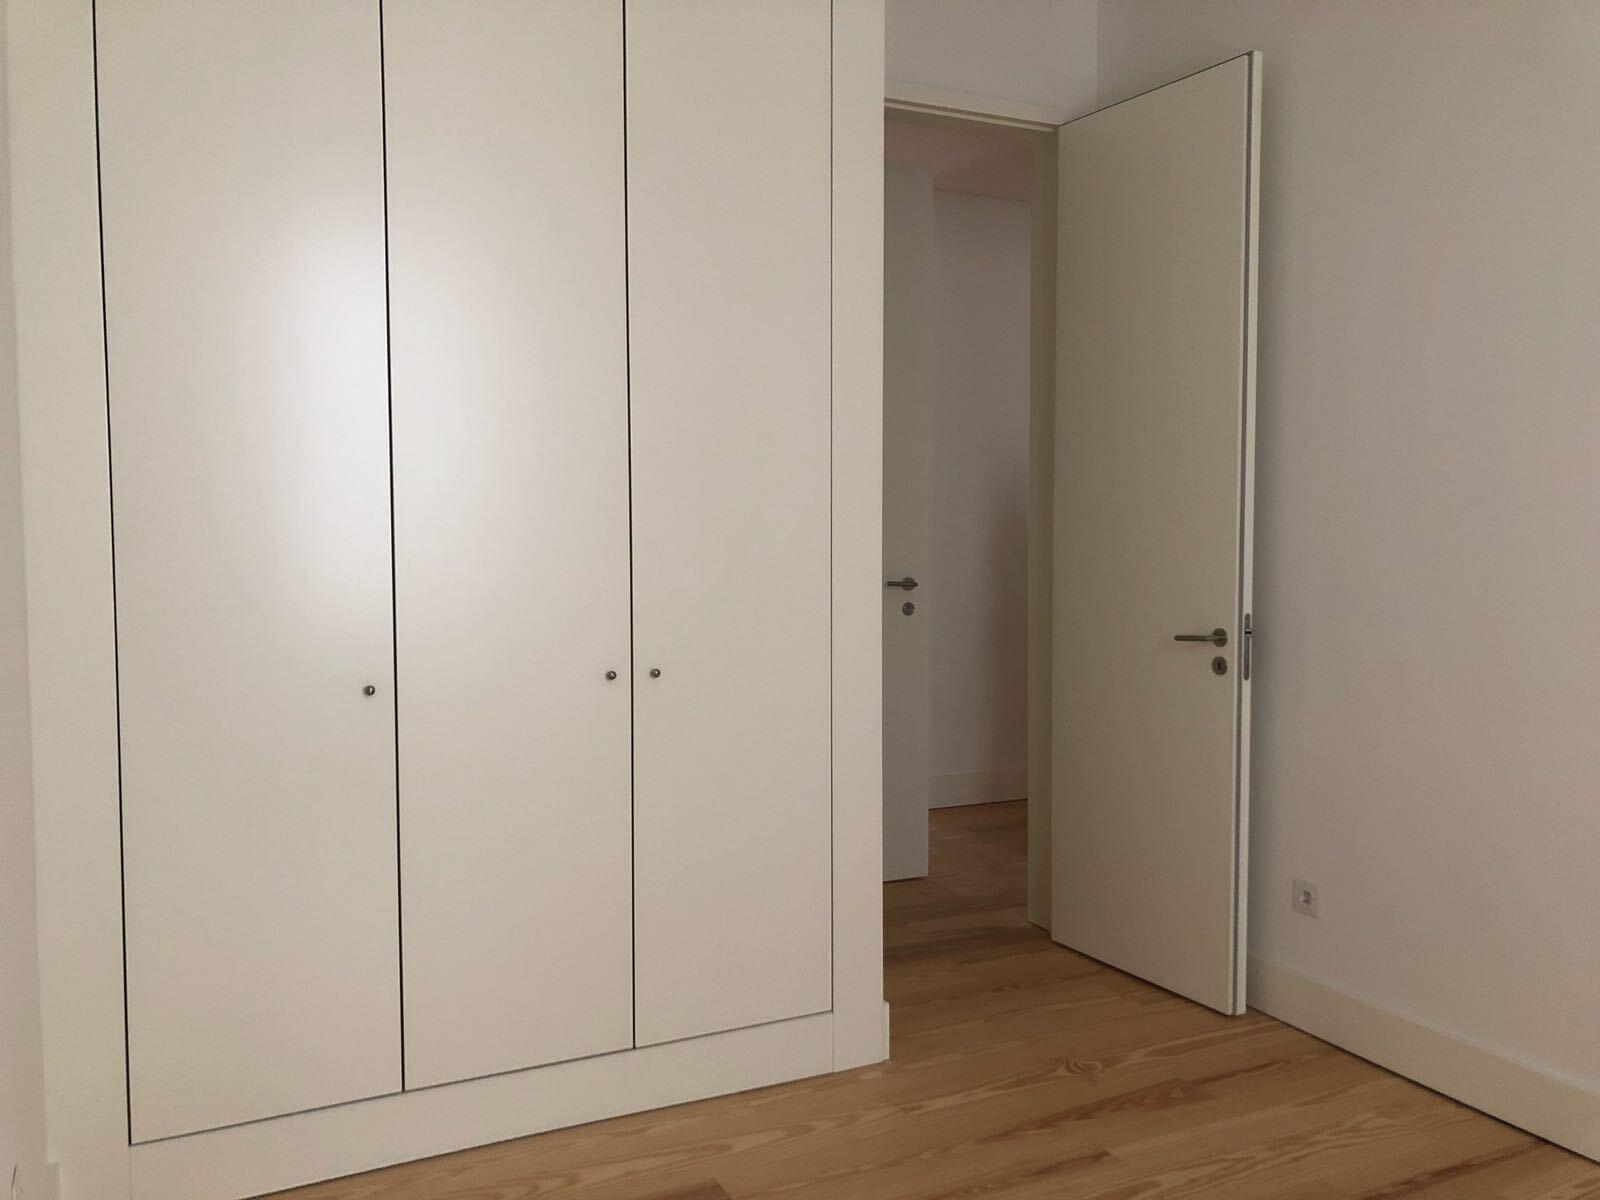 pf17142-apartamento-t2-lisboa-8595eb19-df01-466f-8b22-94b57ee462d1